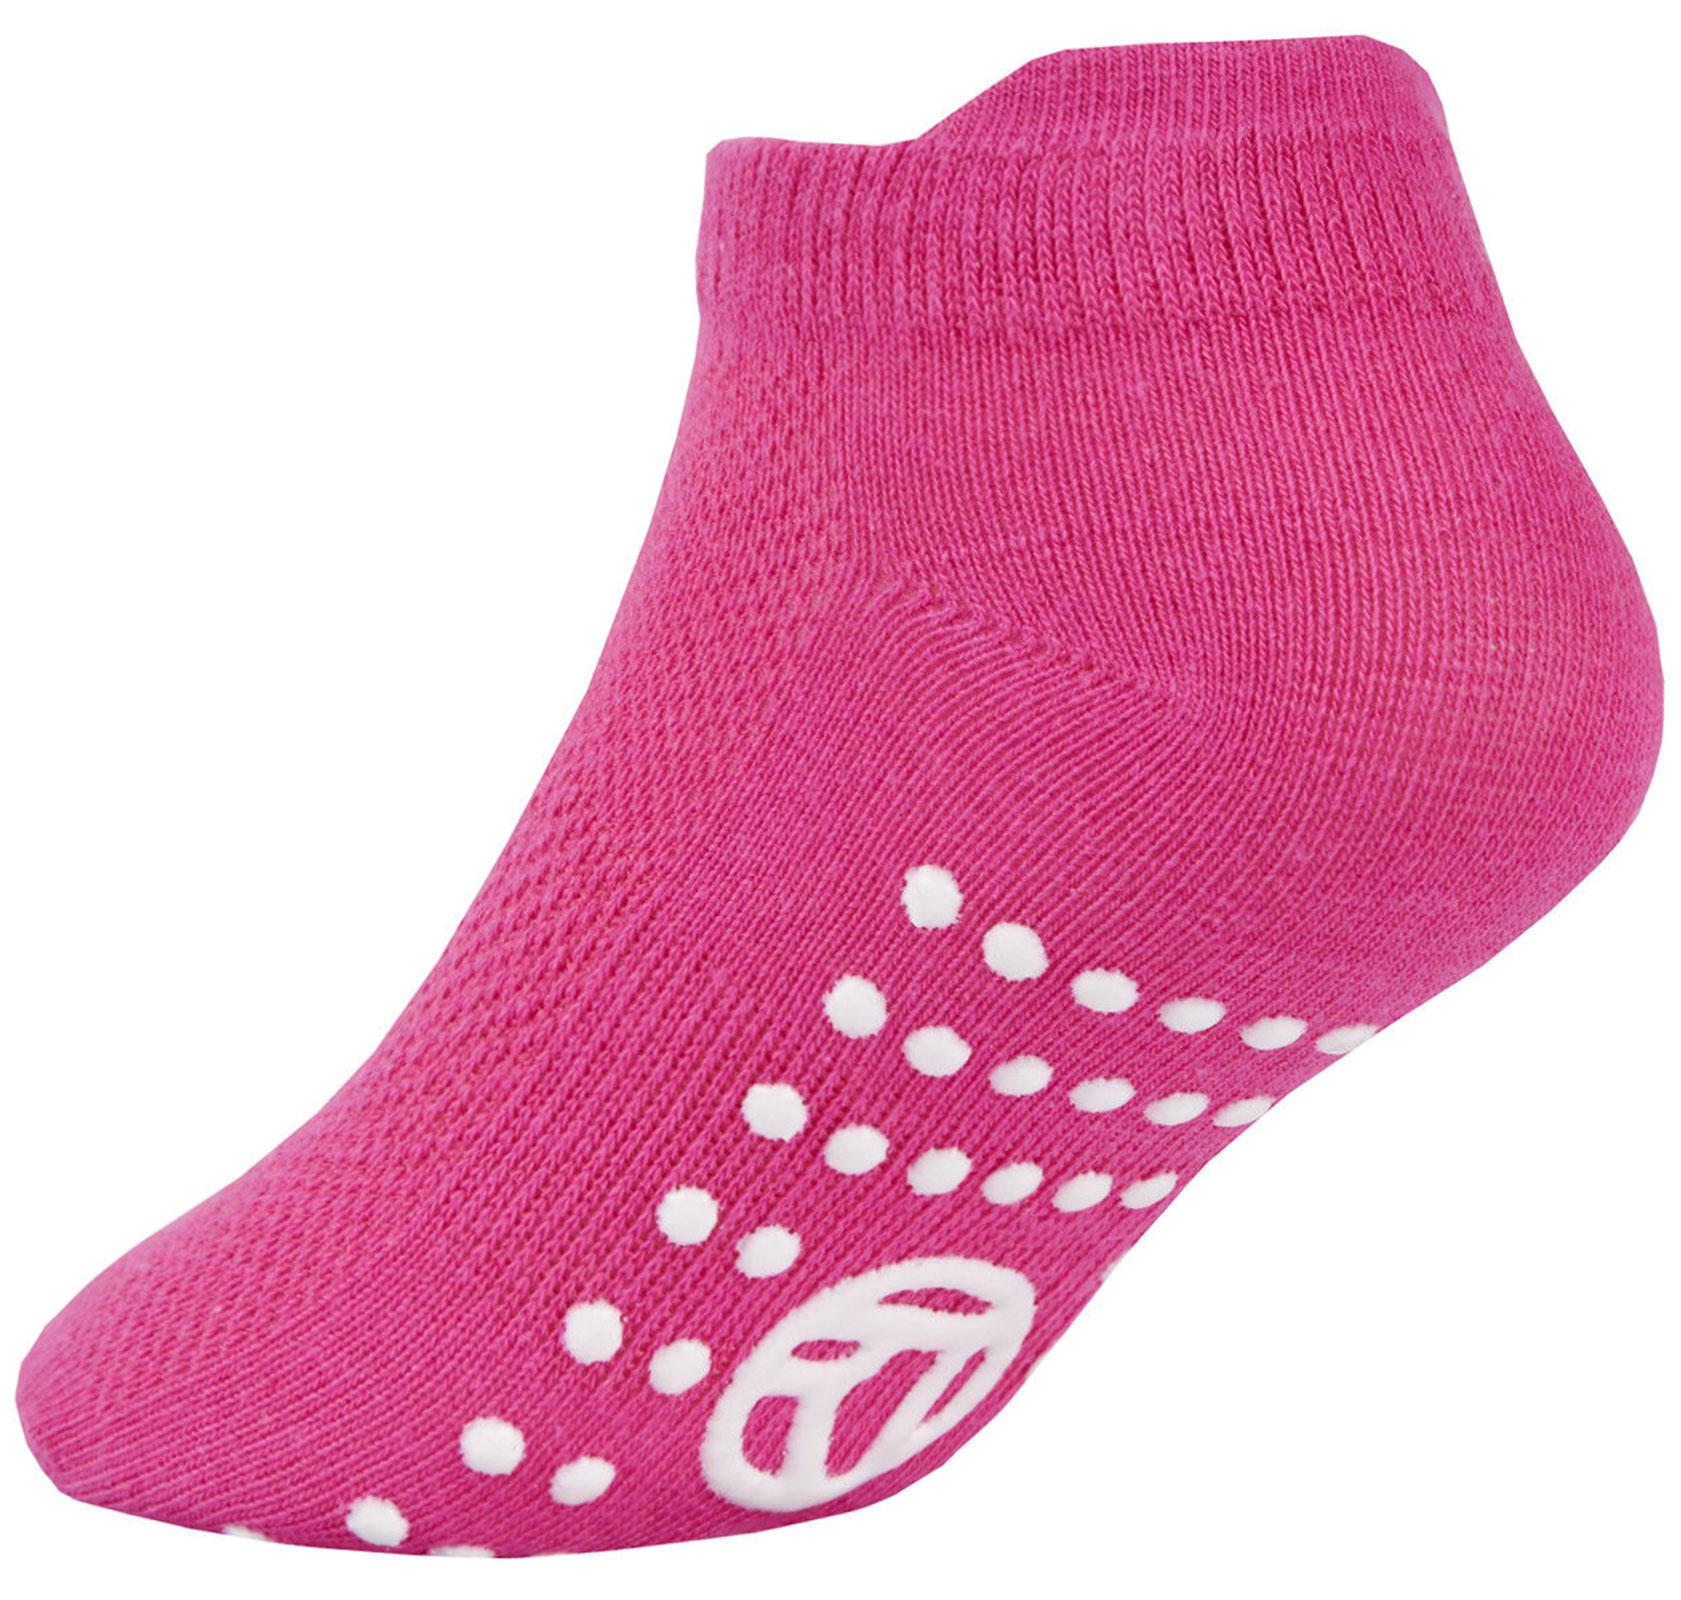 3-Pairs-Girls-Socks-Kids-Gripper-Trainer-Socks-Sports-Liners-Trampoline-Non-Slip